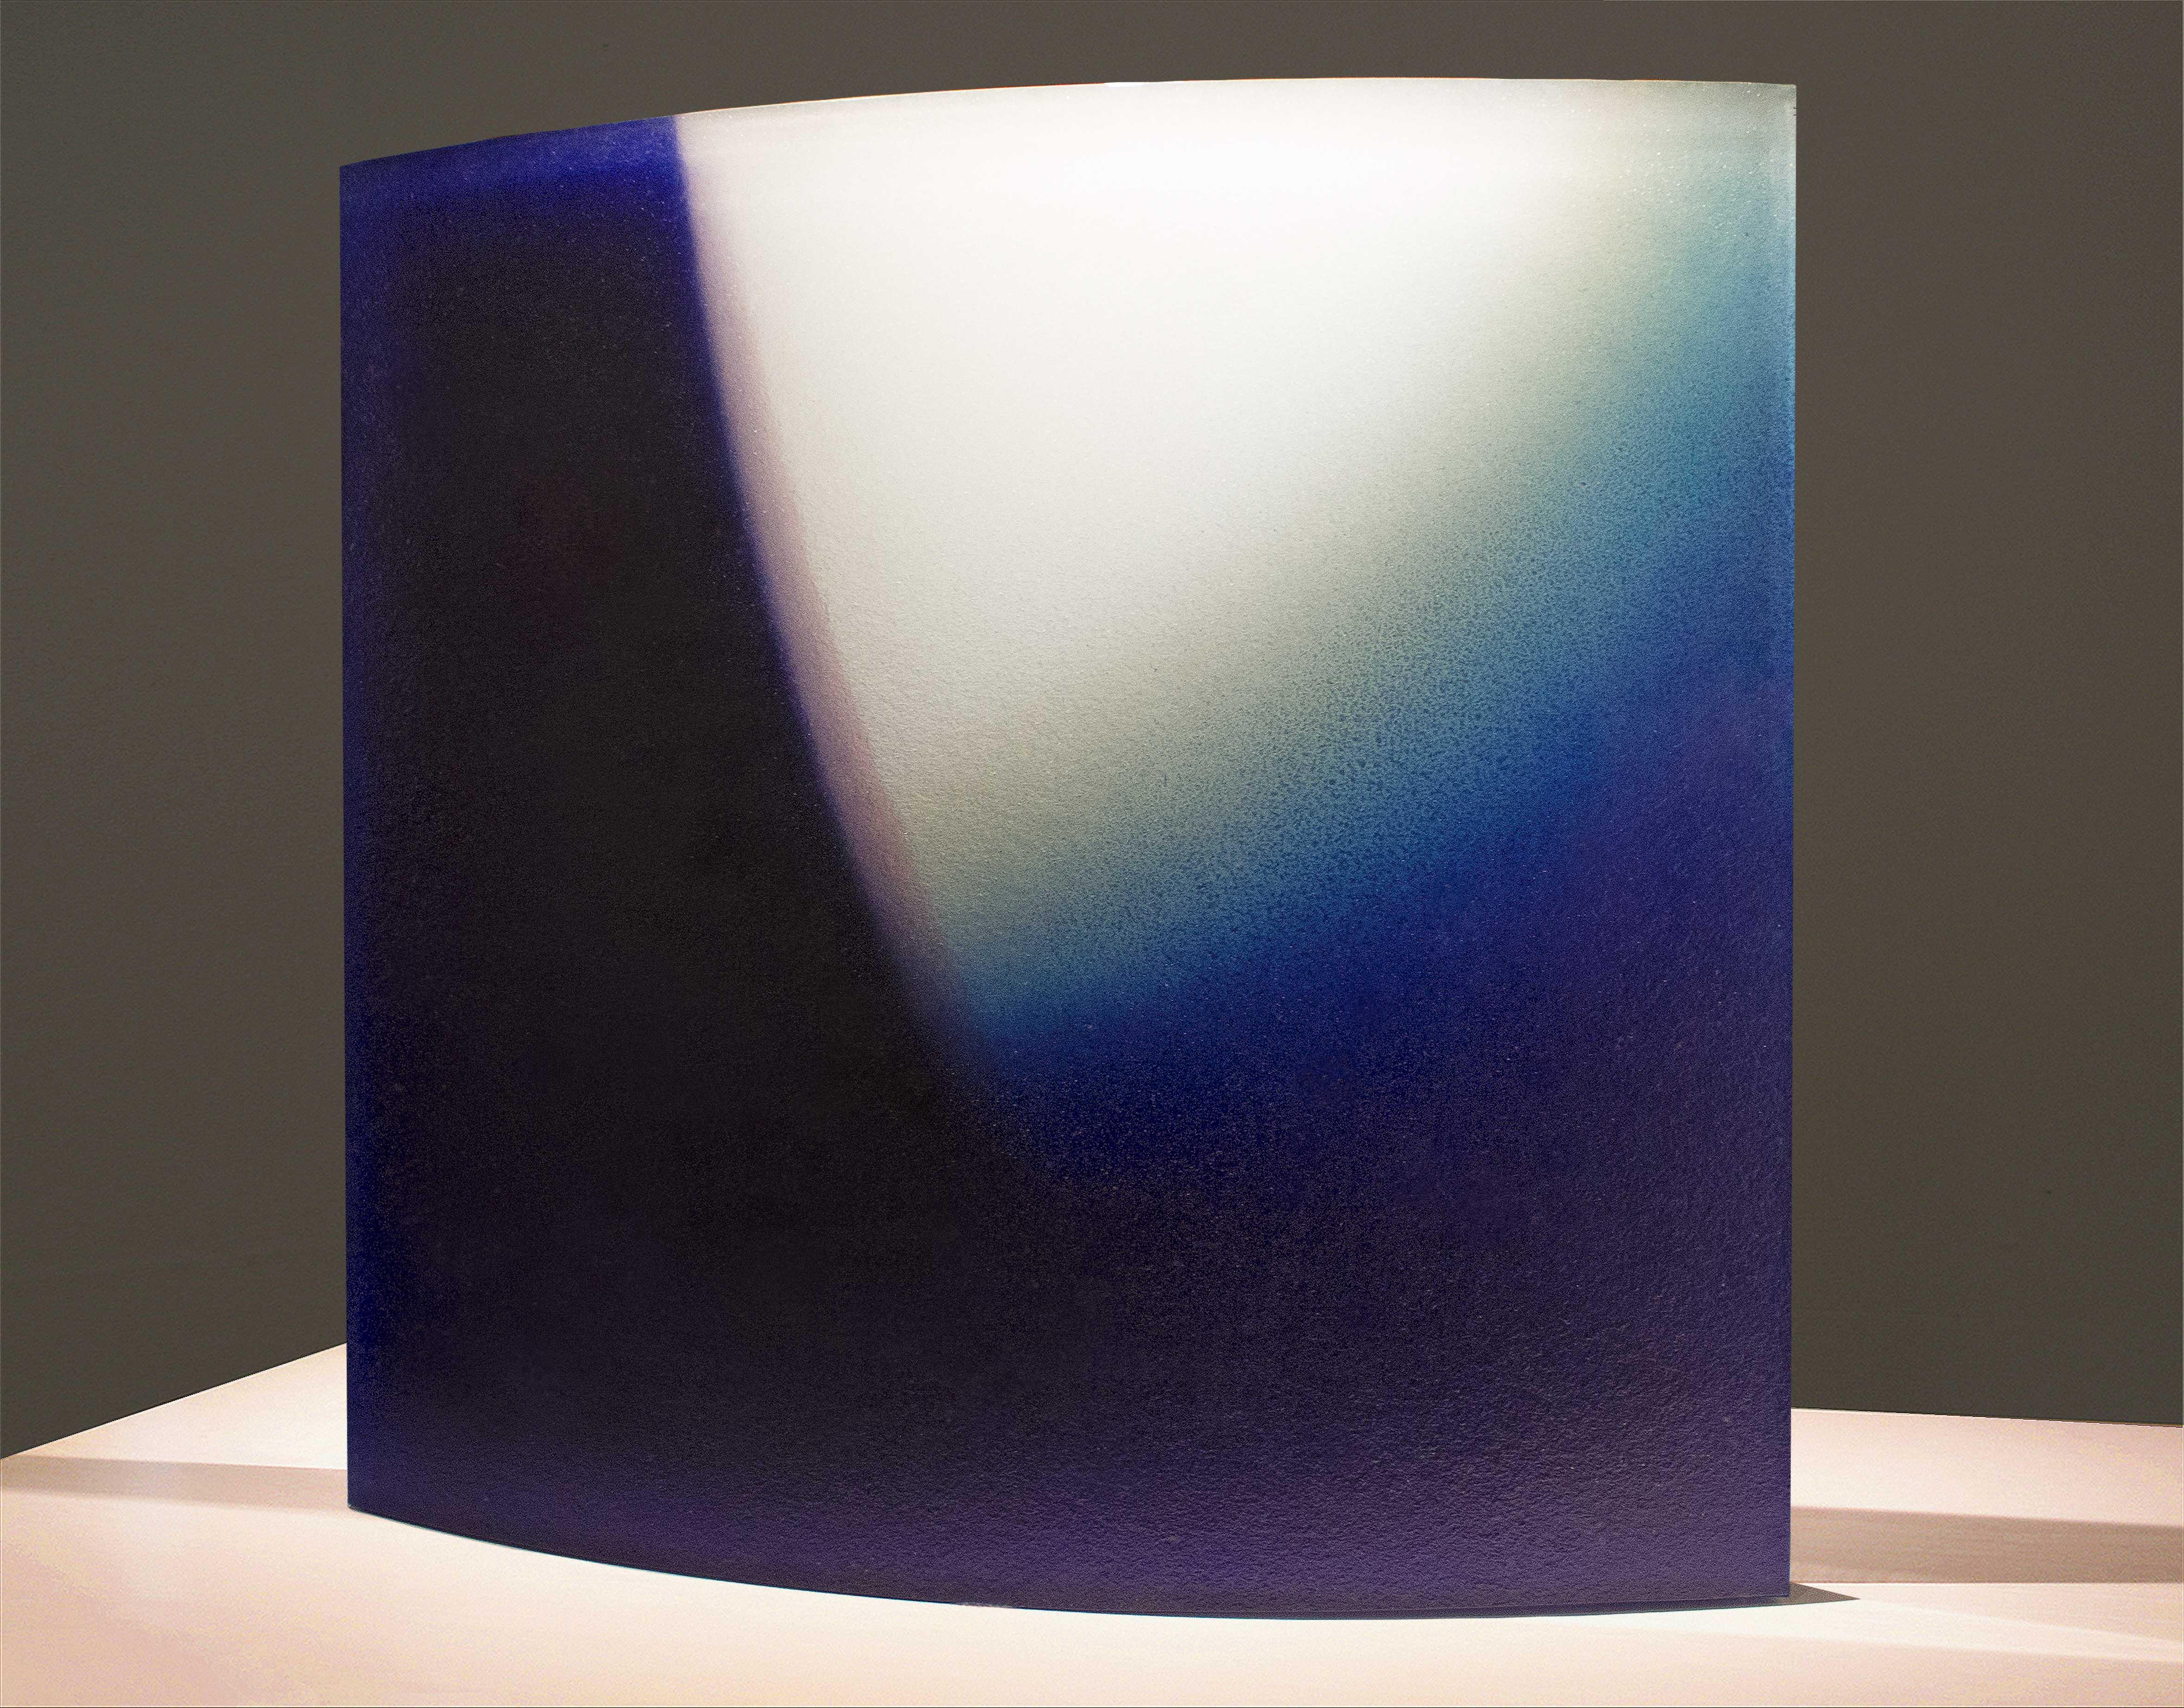 spacecolor blue 2015